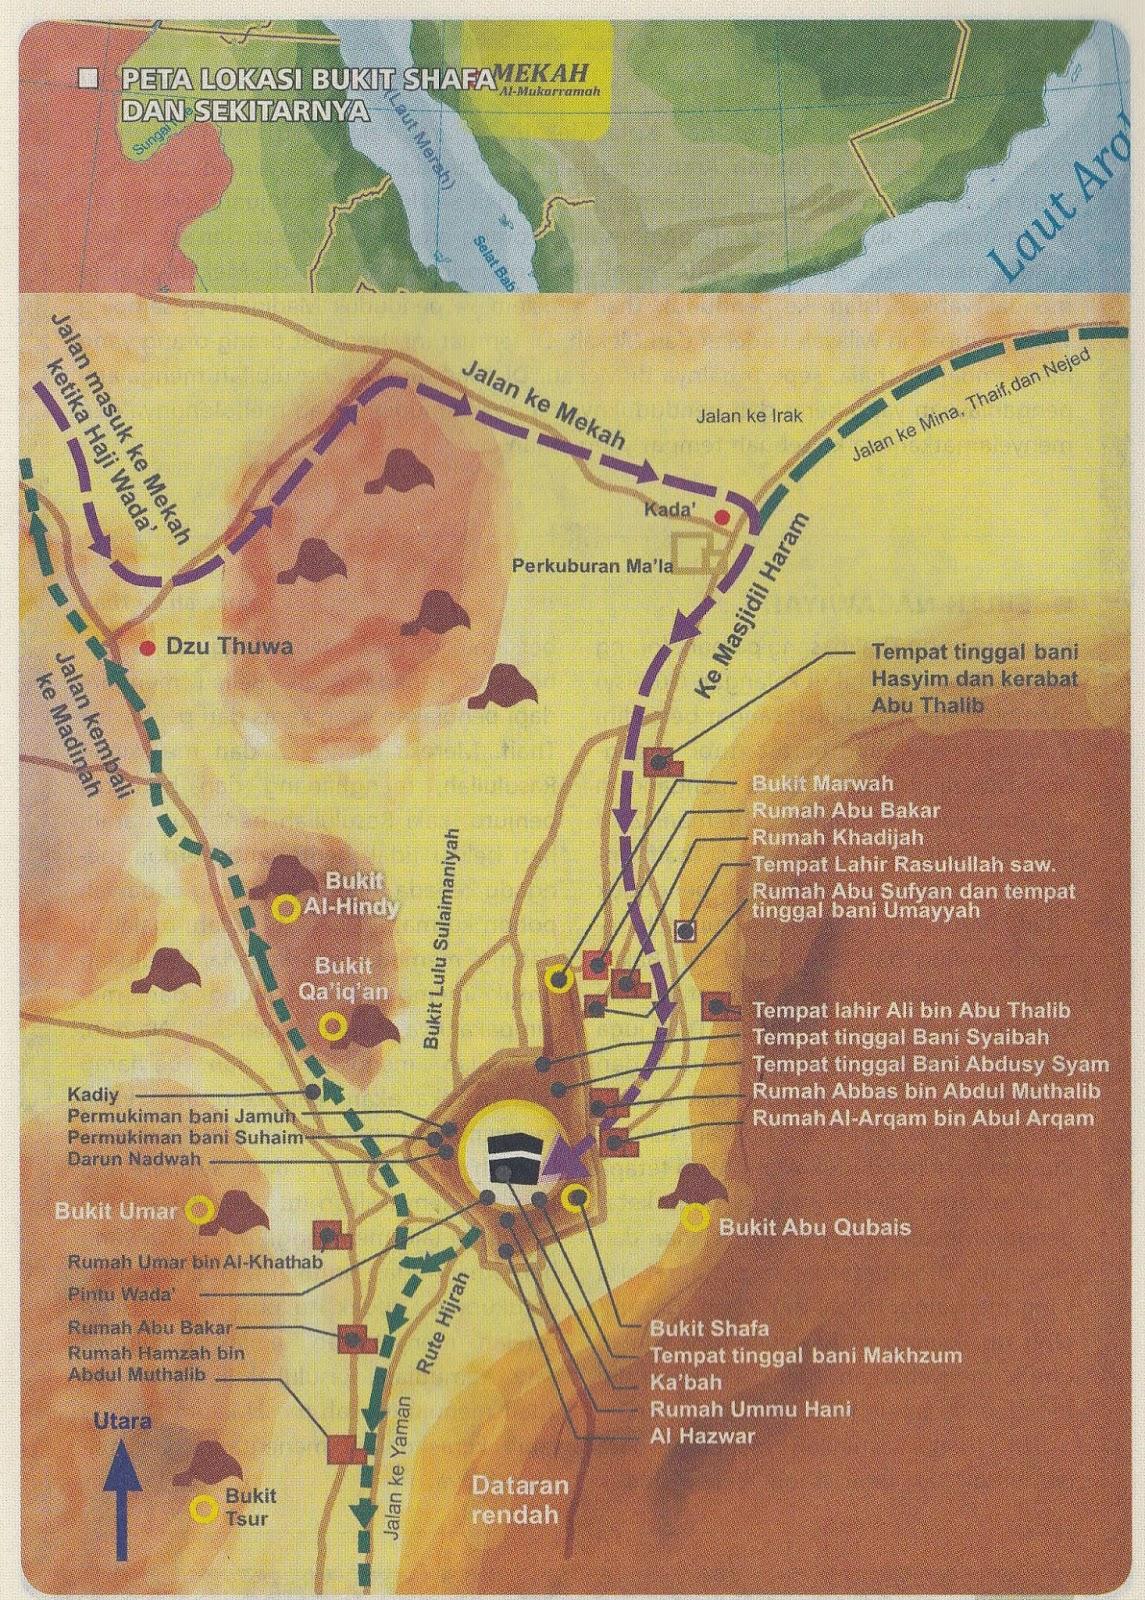 Bukit Safa Marwa : bukit, marwa, Nurul, Bukit, Shafa, Sekitarnya